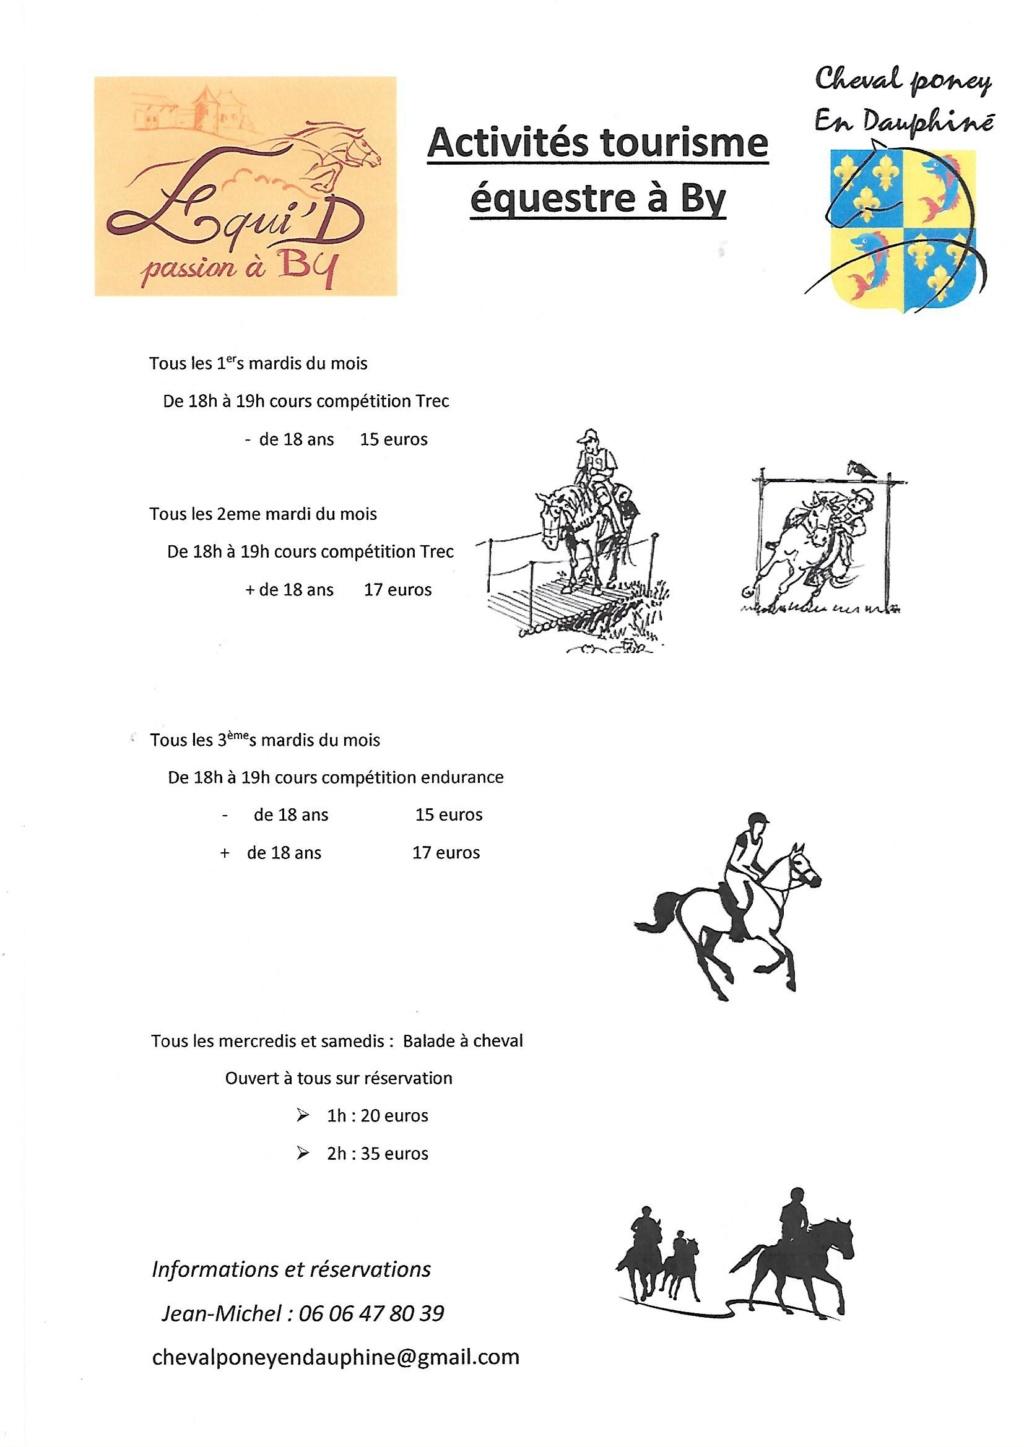 cheval poney en dauphiné Scan_011